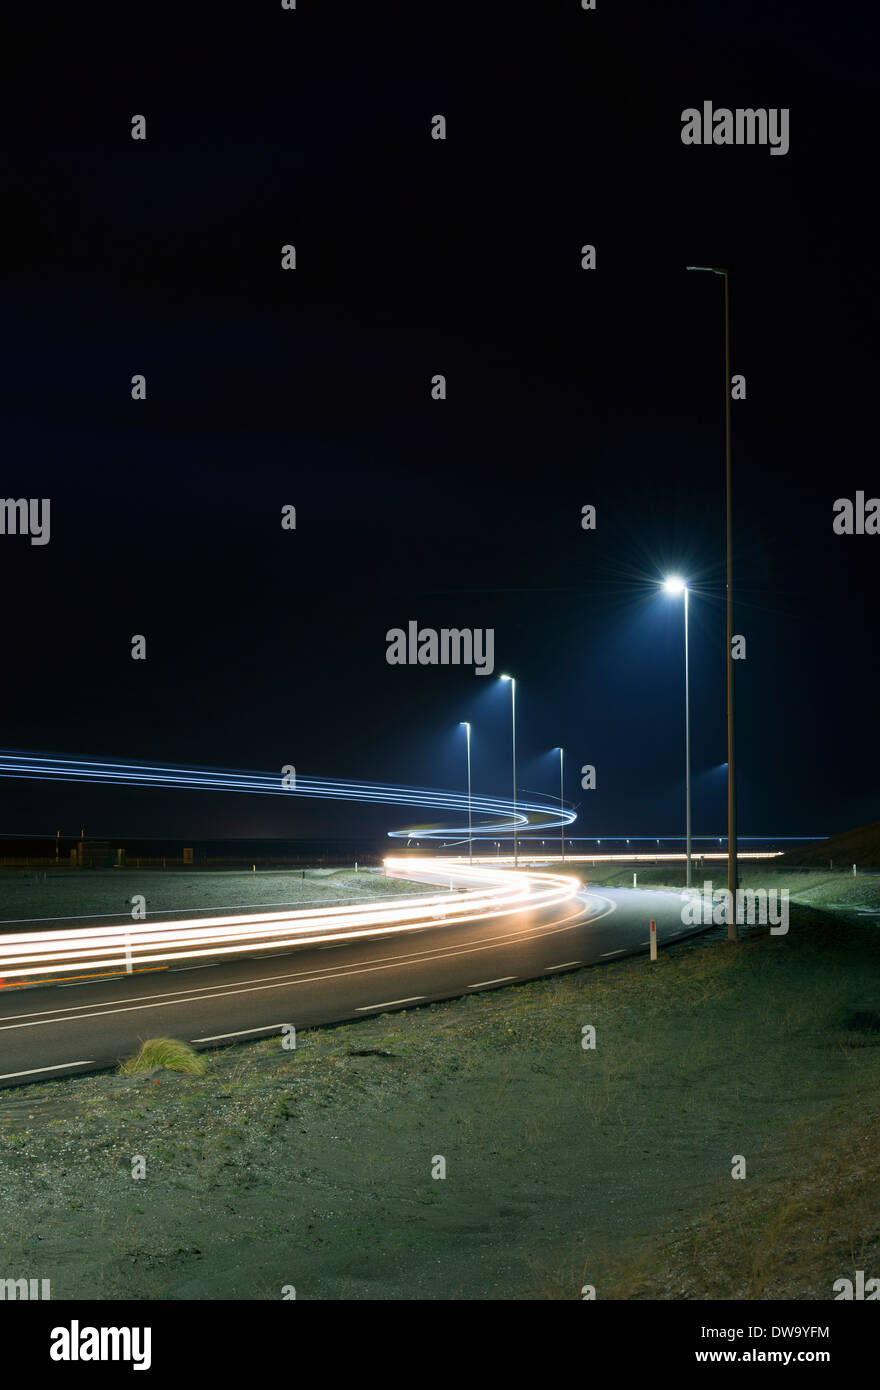 Night time shot of new road built on land reclaimed from sea, Rotterdam harbor, Massvlakte, Rotterdam, Netherlands Stock Photo